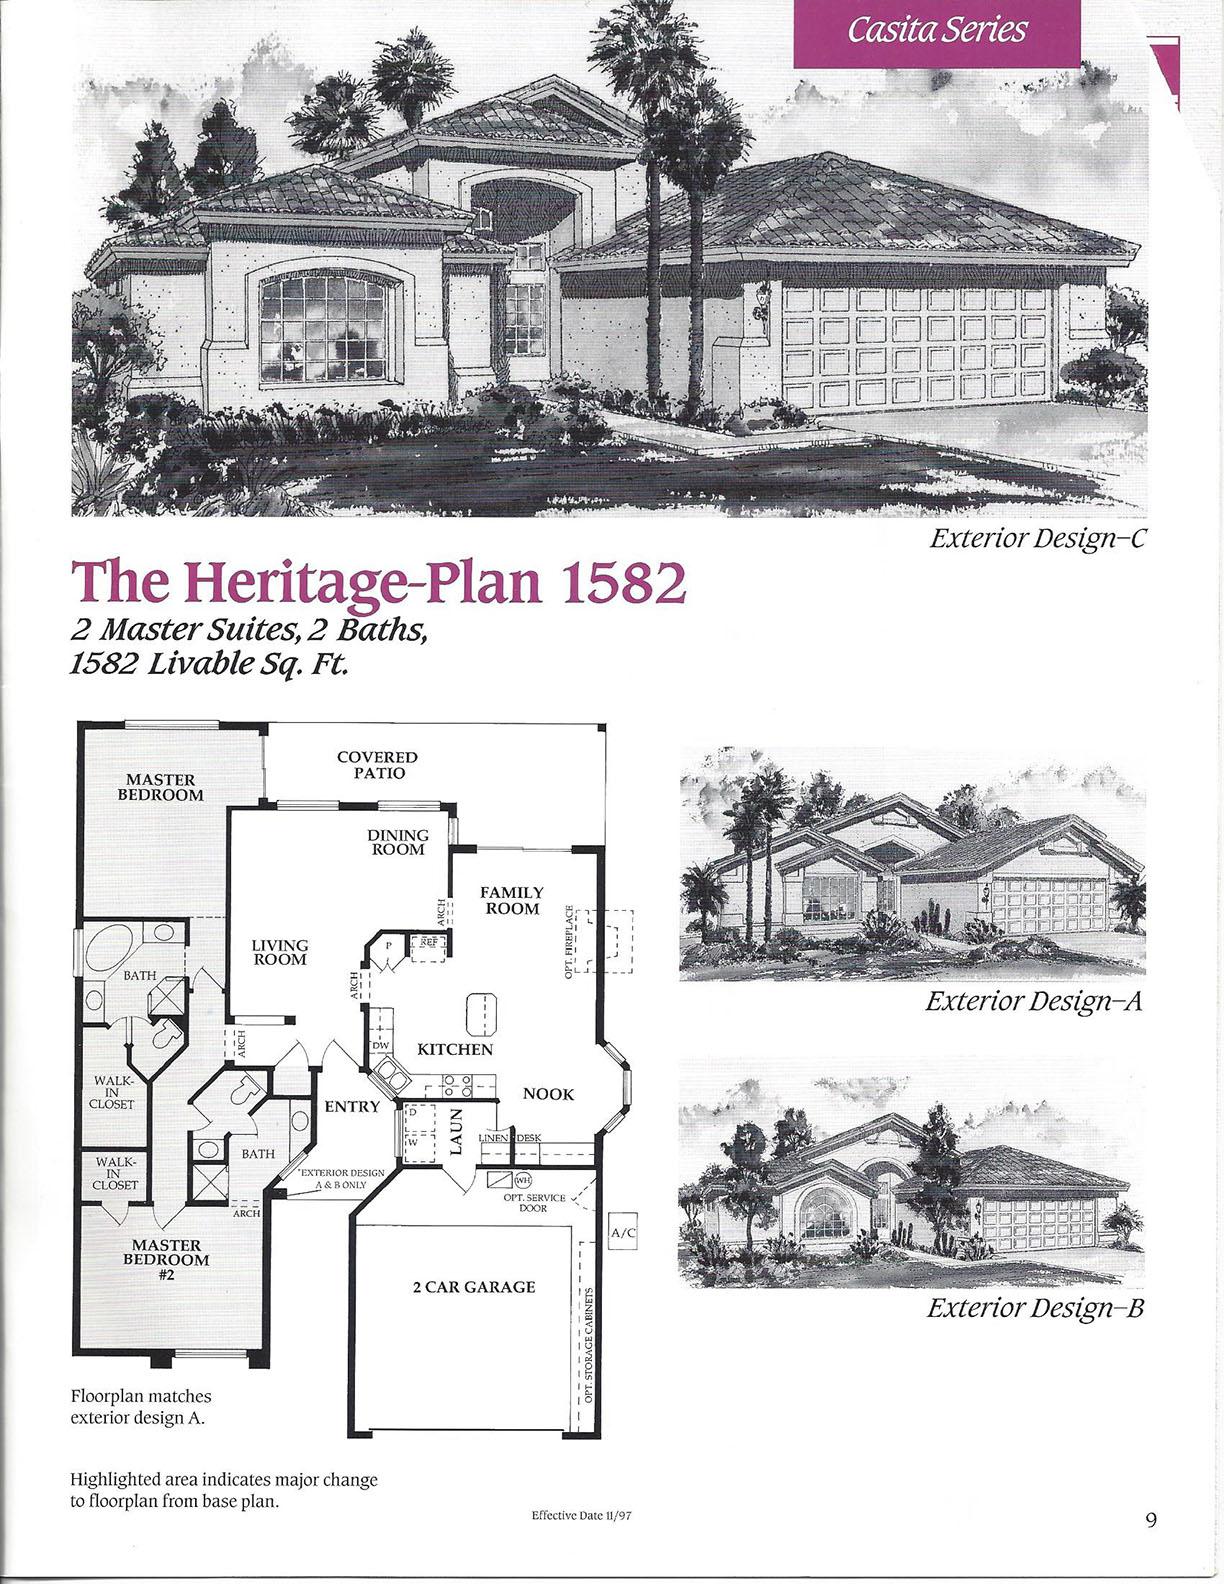 Heritage 1582